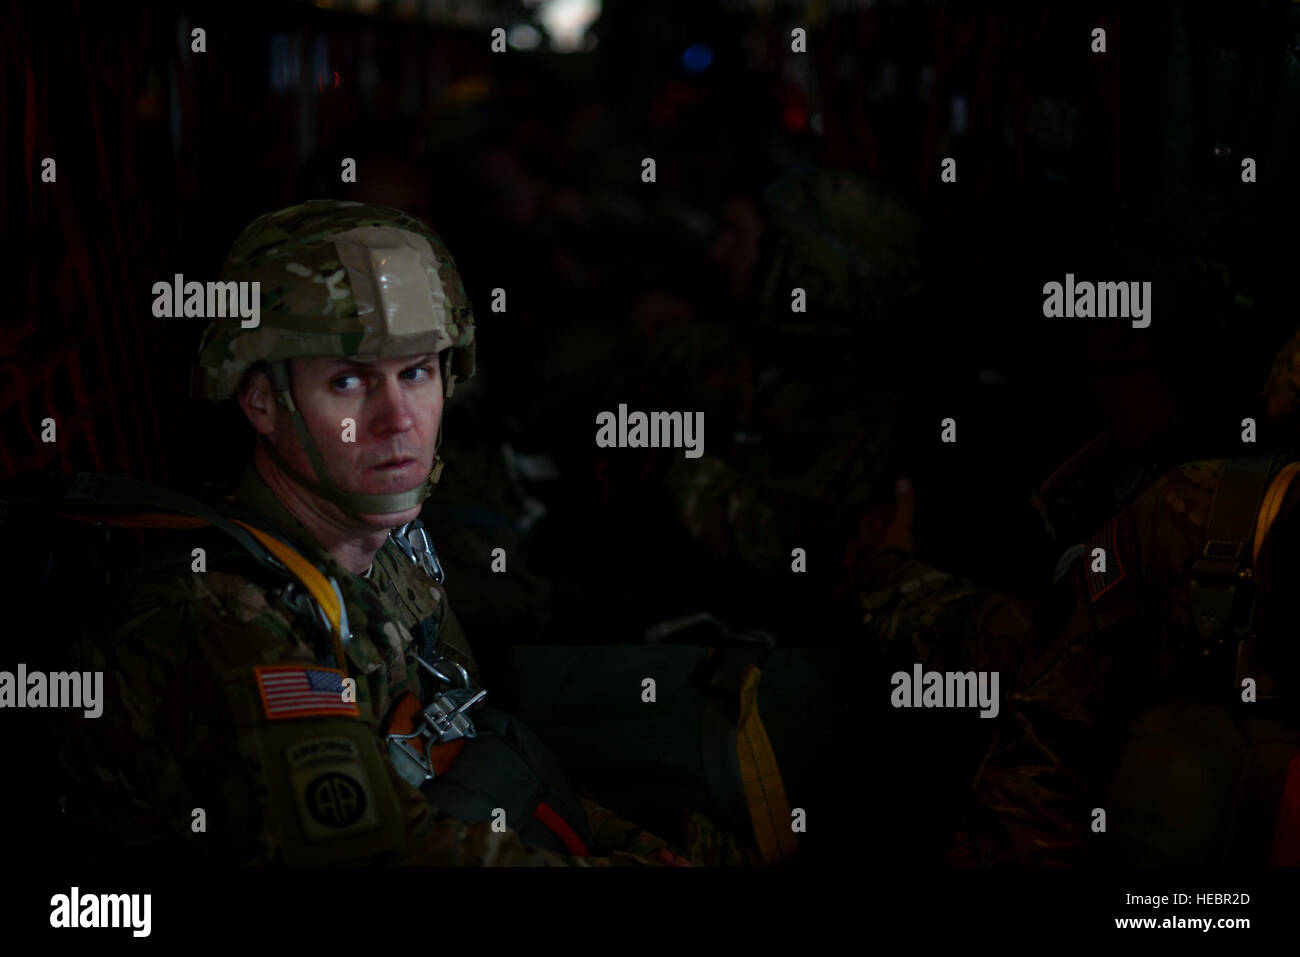 U.S. Army Lt. Col. William Kirby,4th Battalion, 319th Airborne field Artillery Regiment, 173rd Airborne Brigade - Stock Image